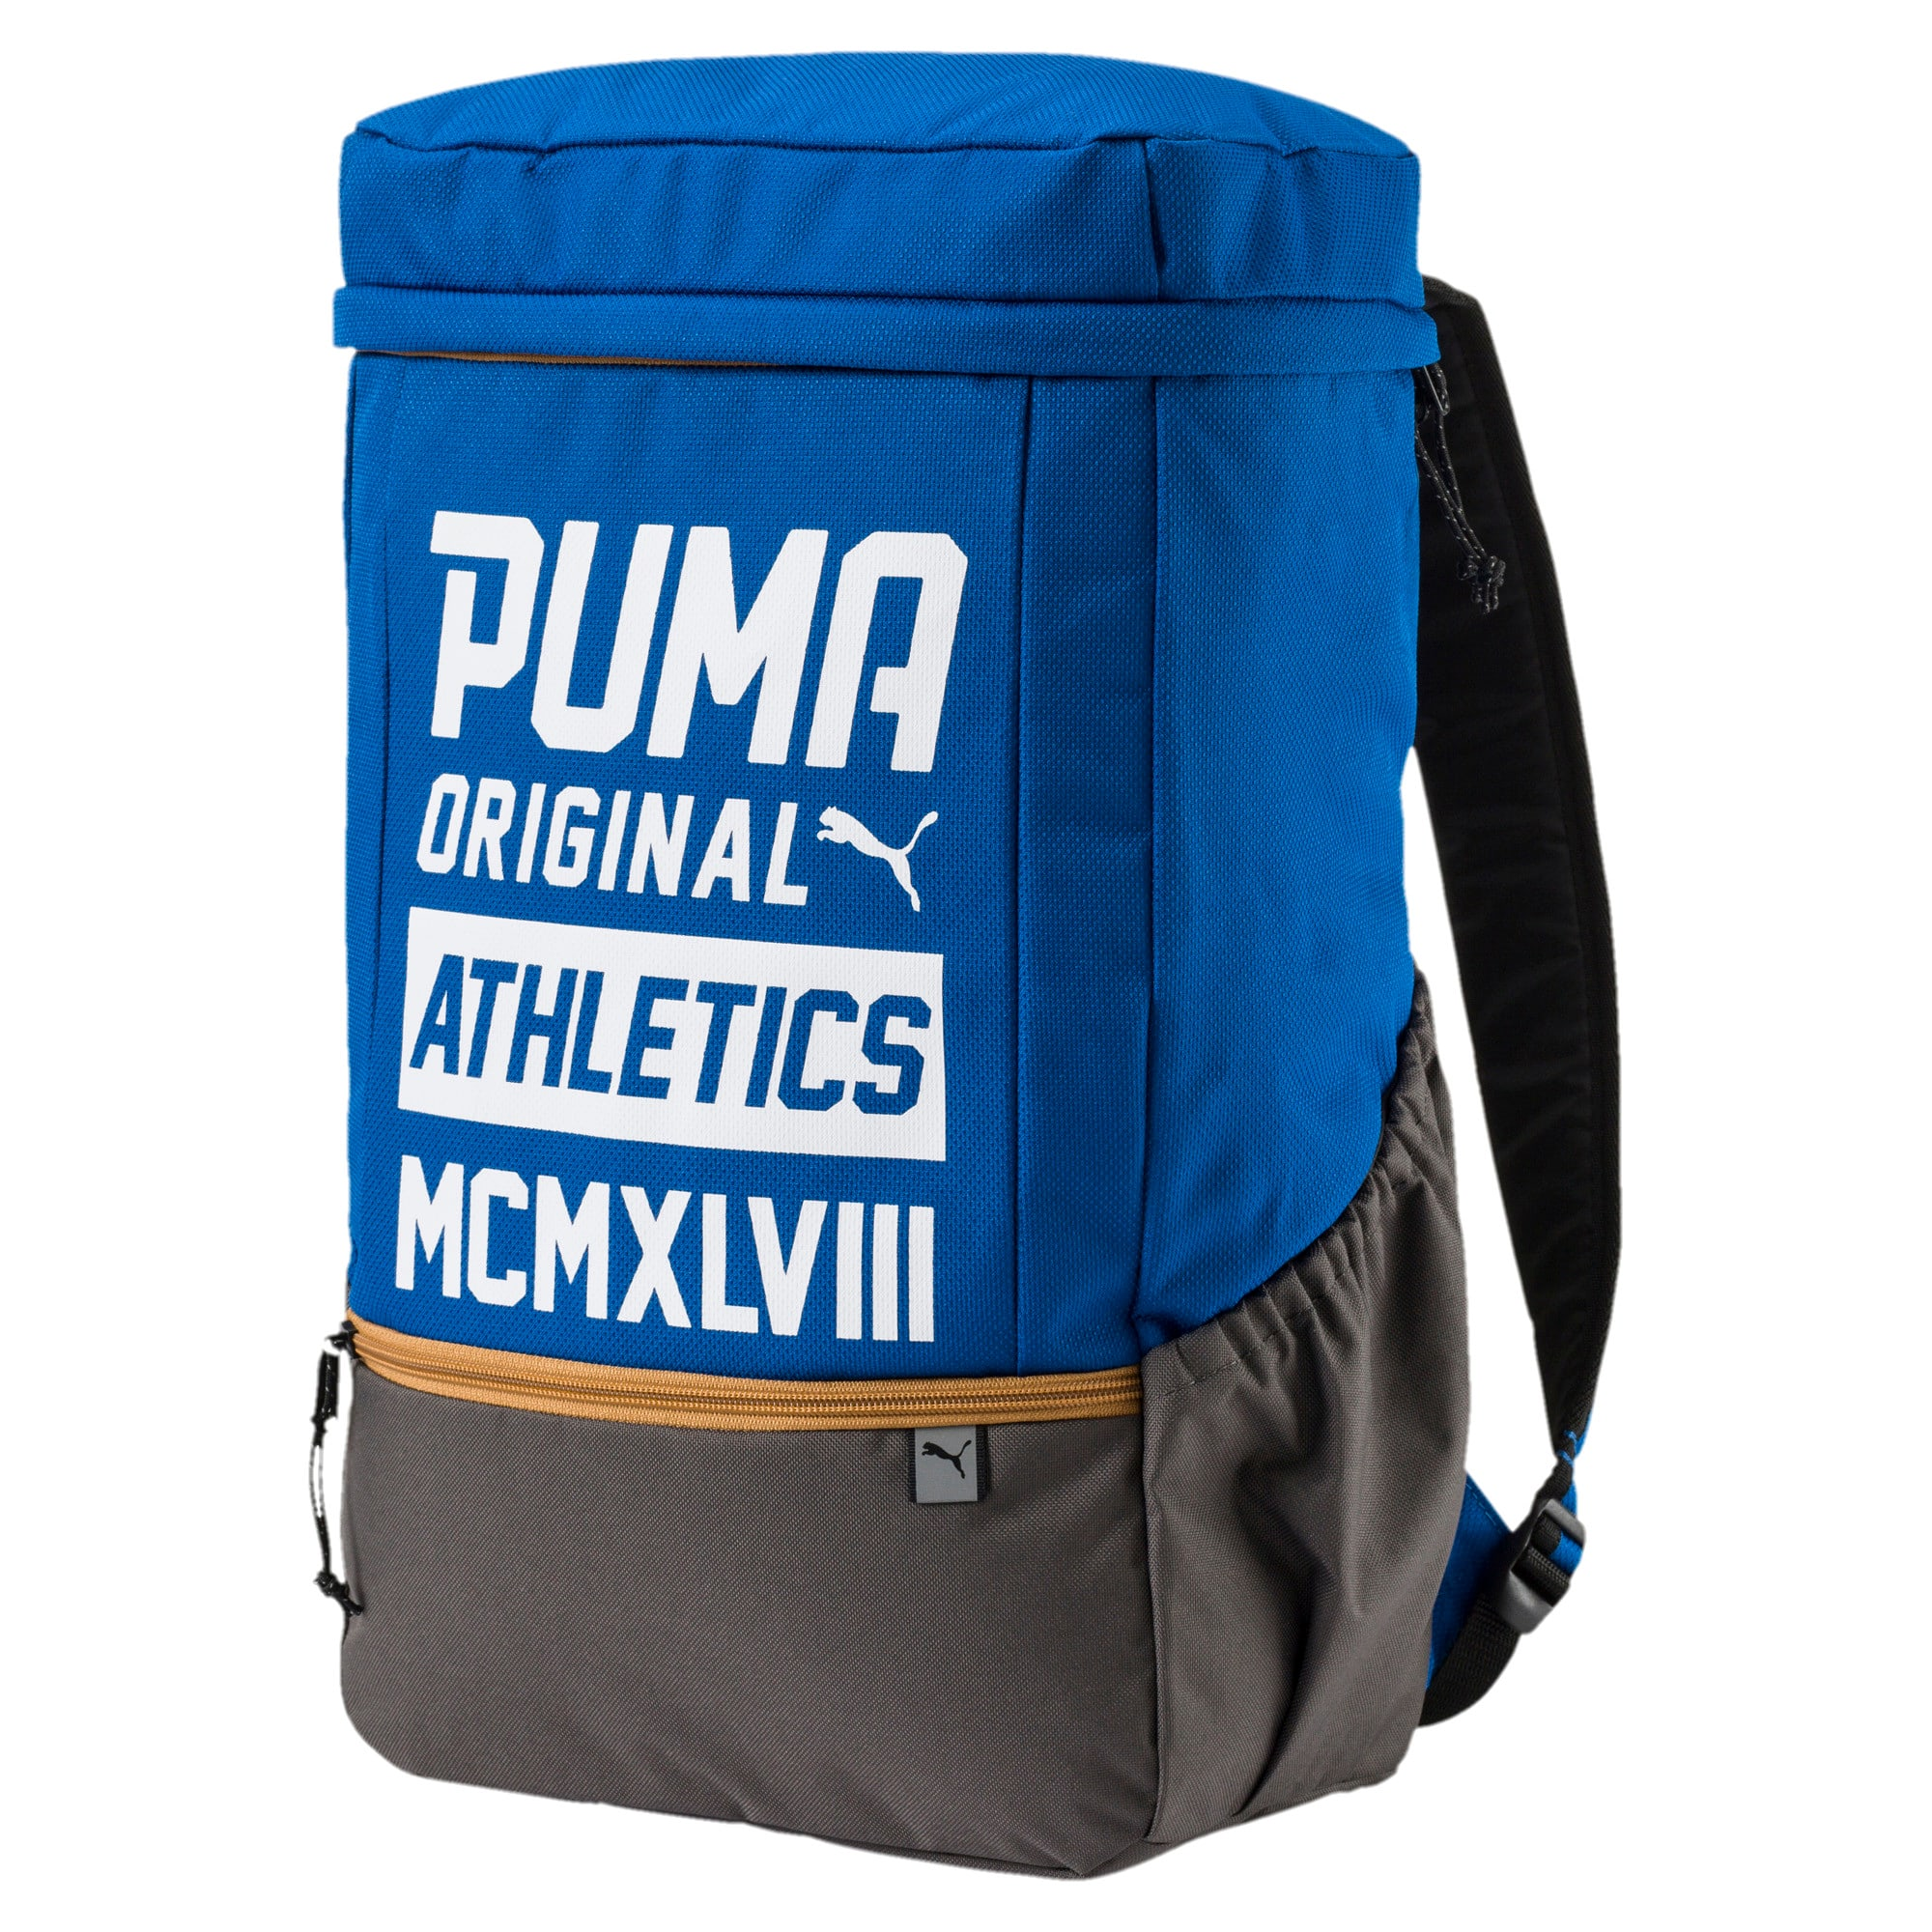 Thumbnail 1 of Sole Backpack Plus, Lapis Blue-Puma White, medium-IND